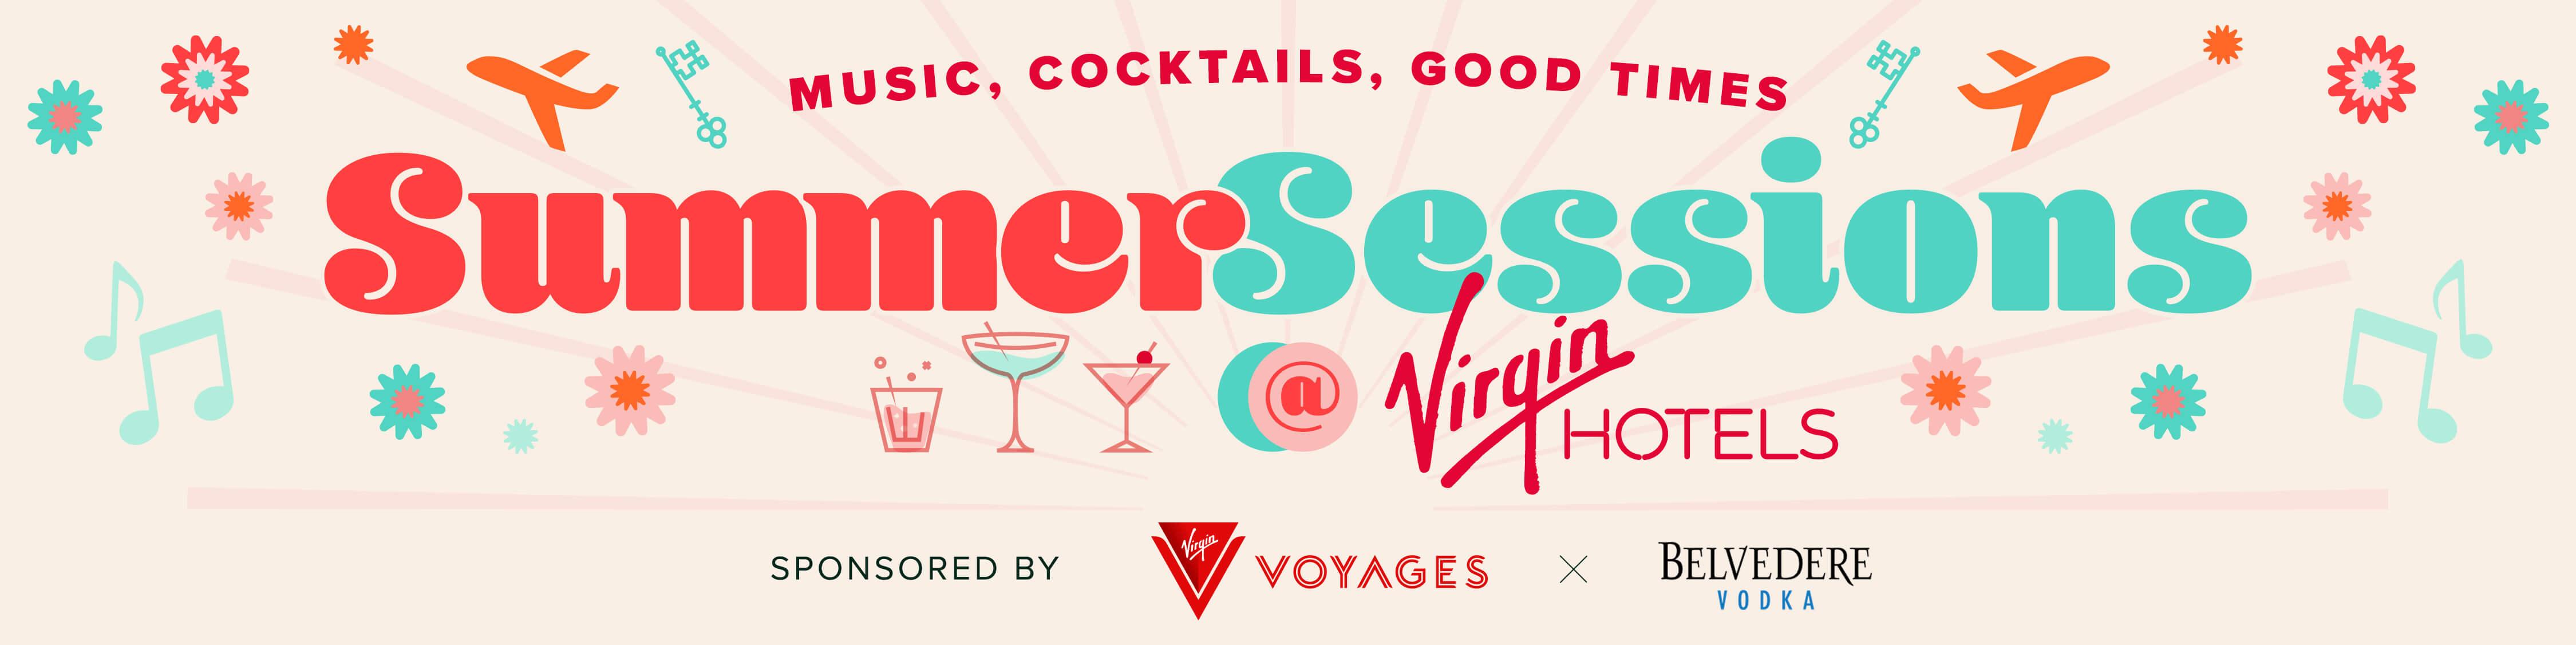 Summer Sessions at Virgin Hotels